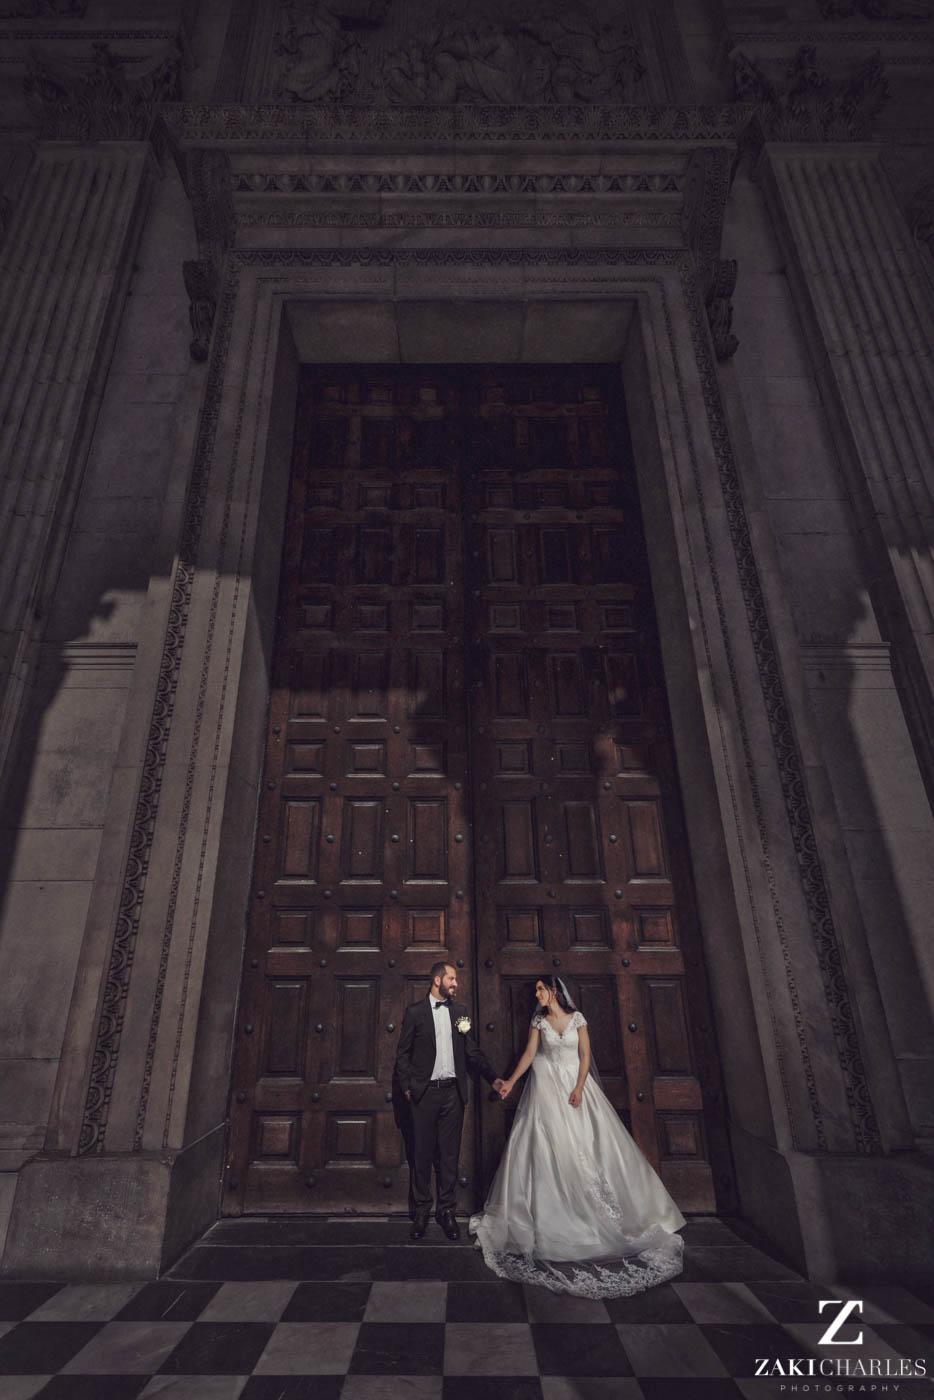 Fine art wedding photography at Marriott Hotel Regents Park 2